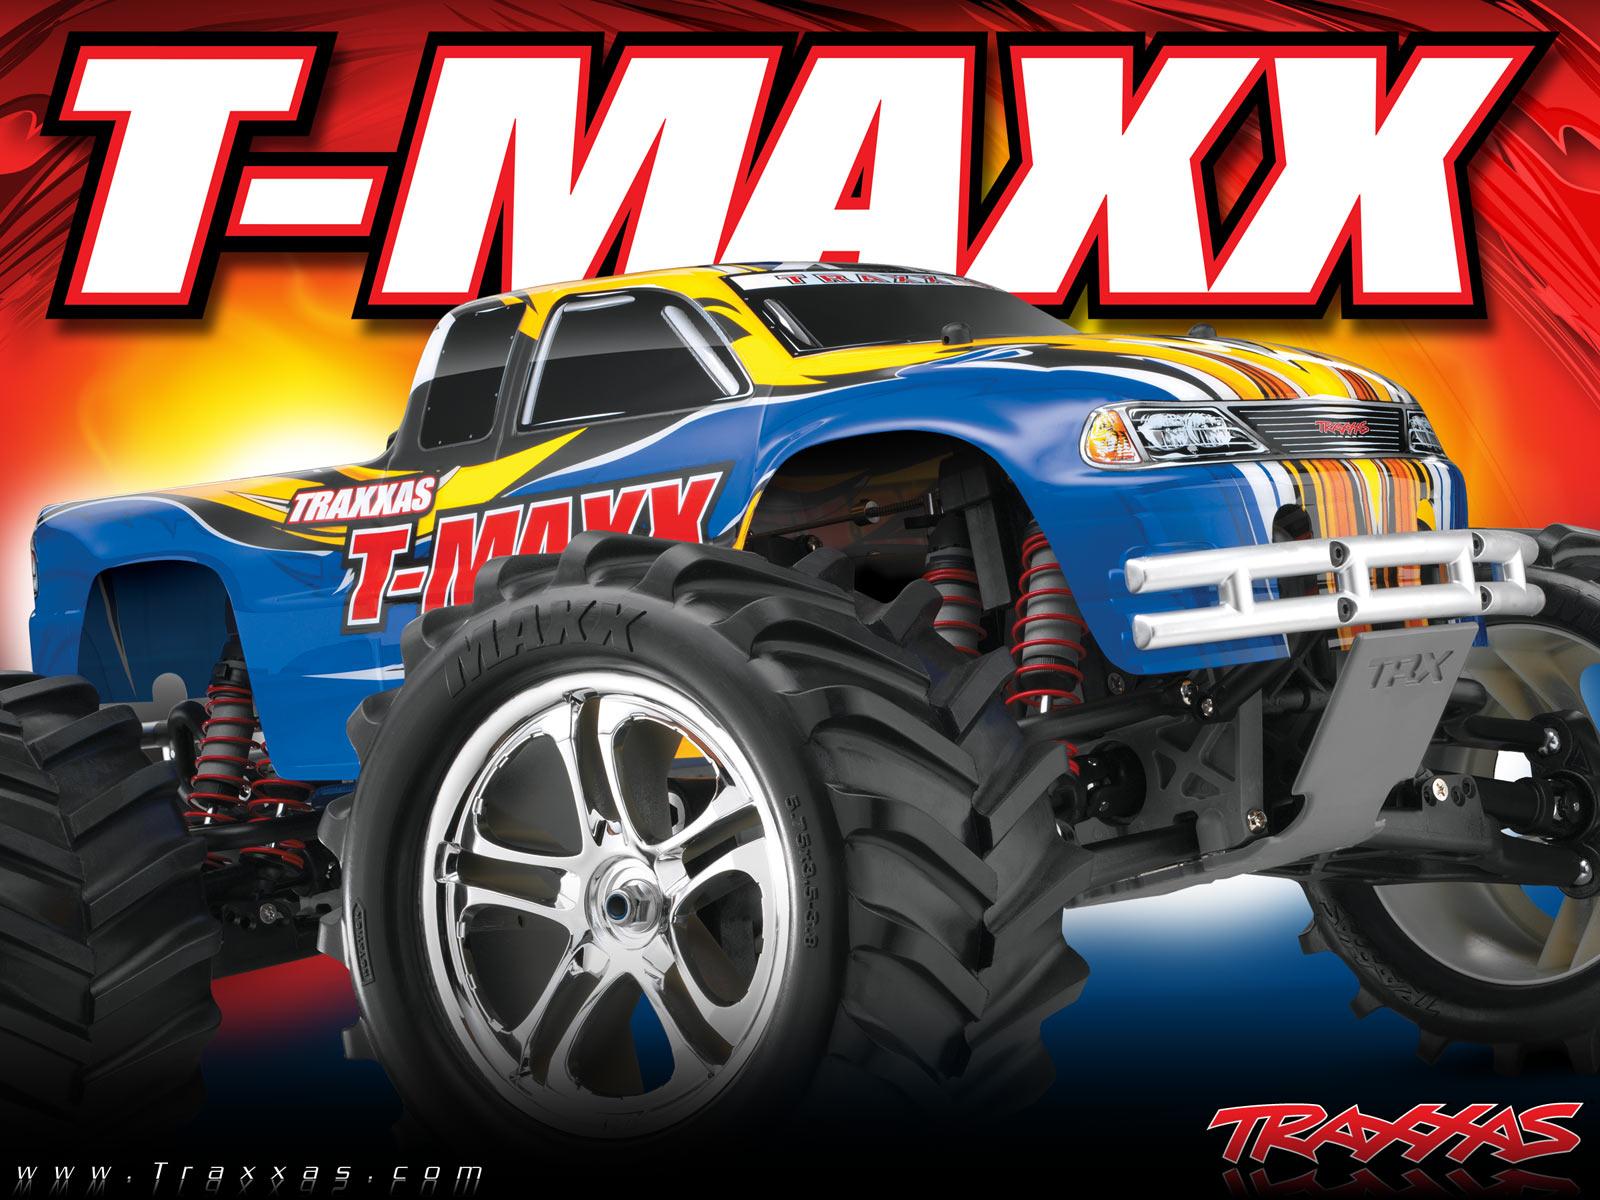 Monster Truck Rc Cars >> Traxxas Wallpaper - WallpaperSafari